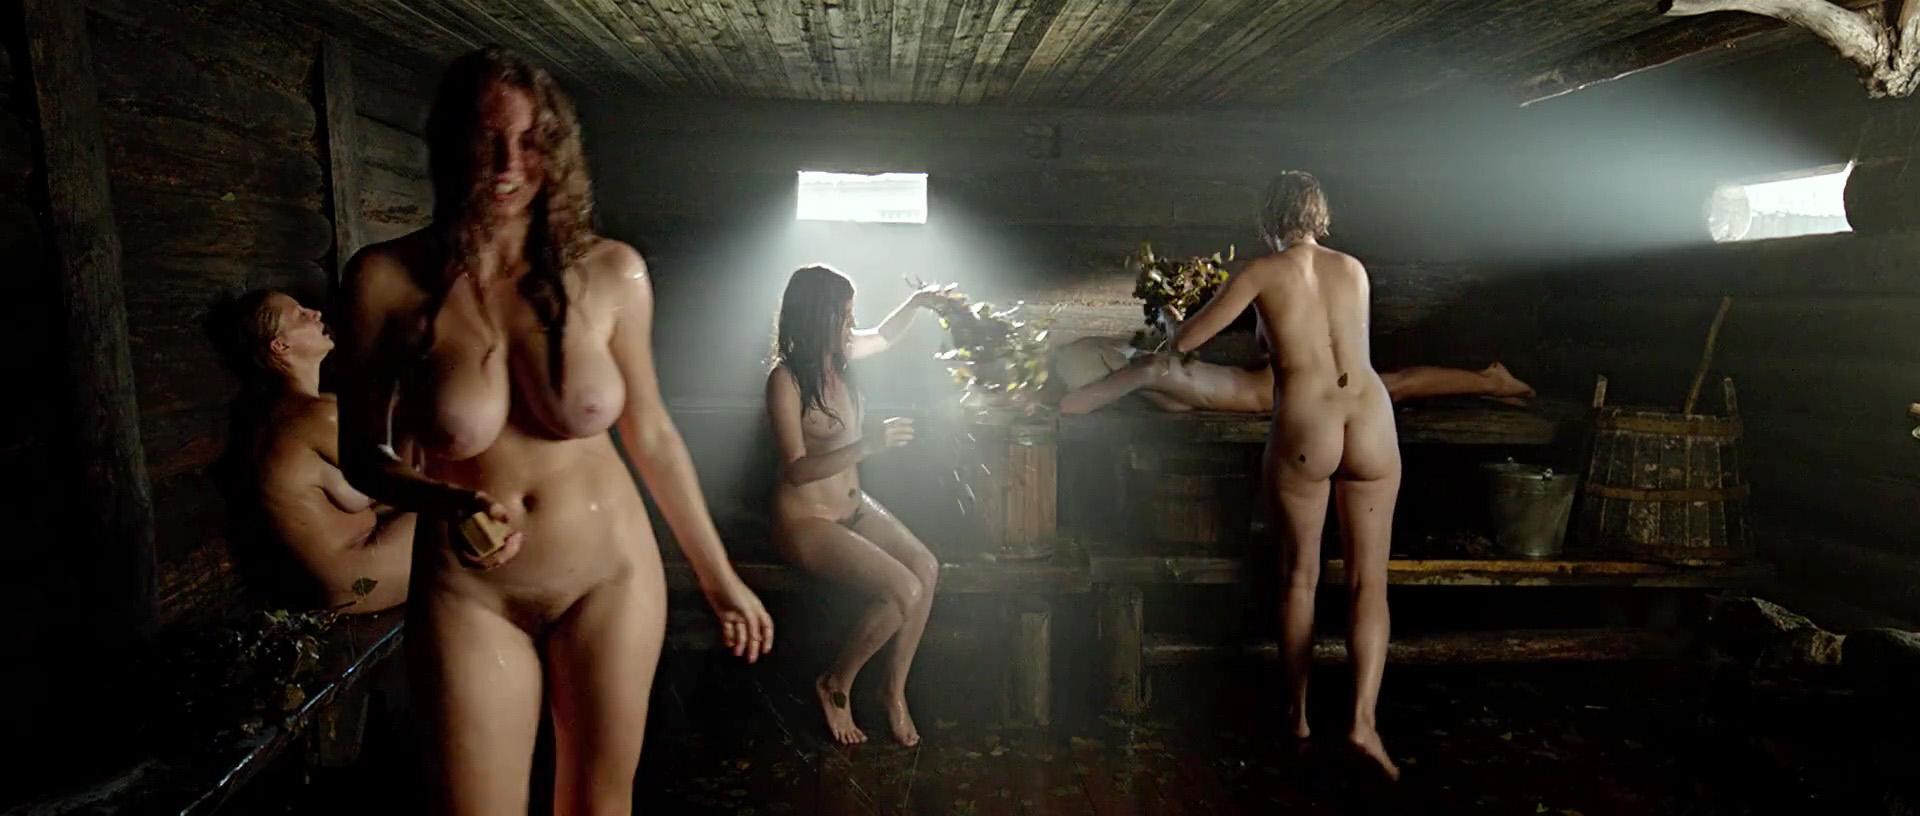 Gosht gril sex fuck photos nude movie